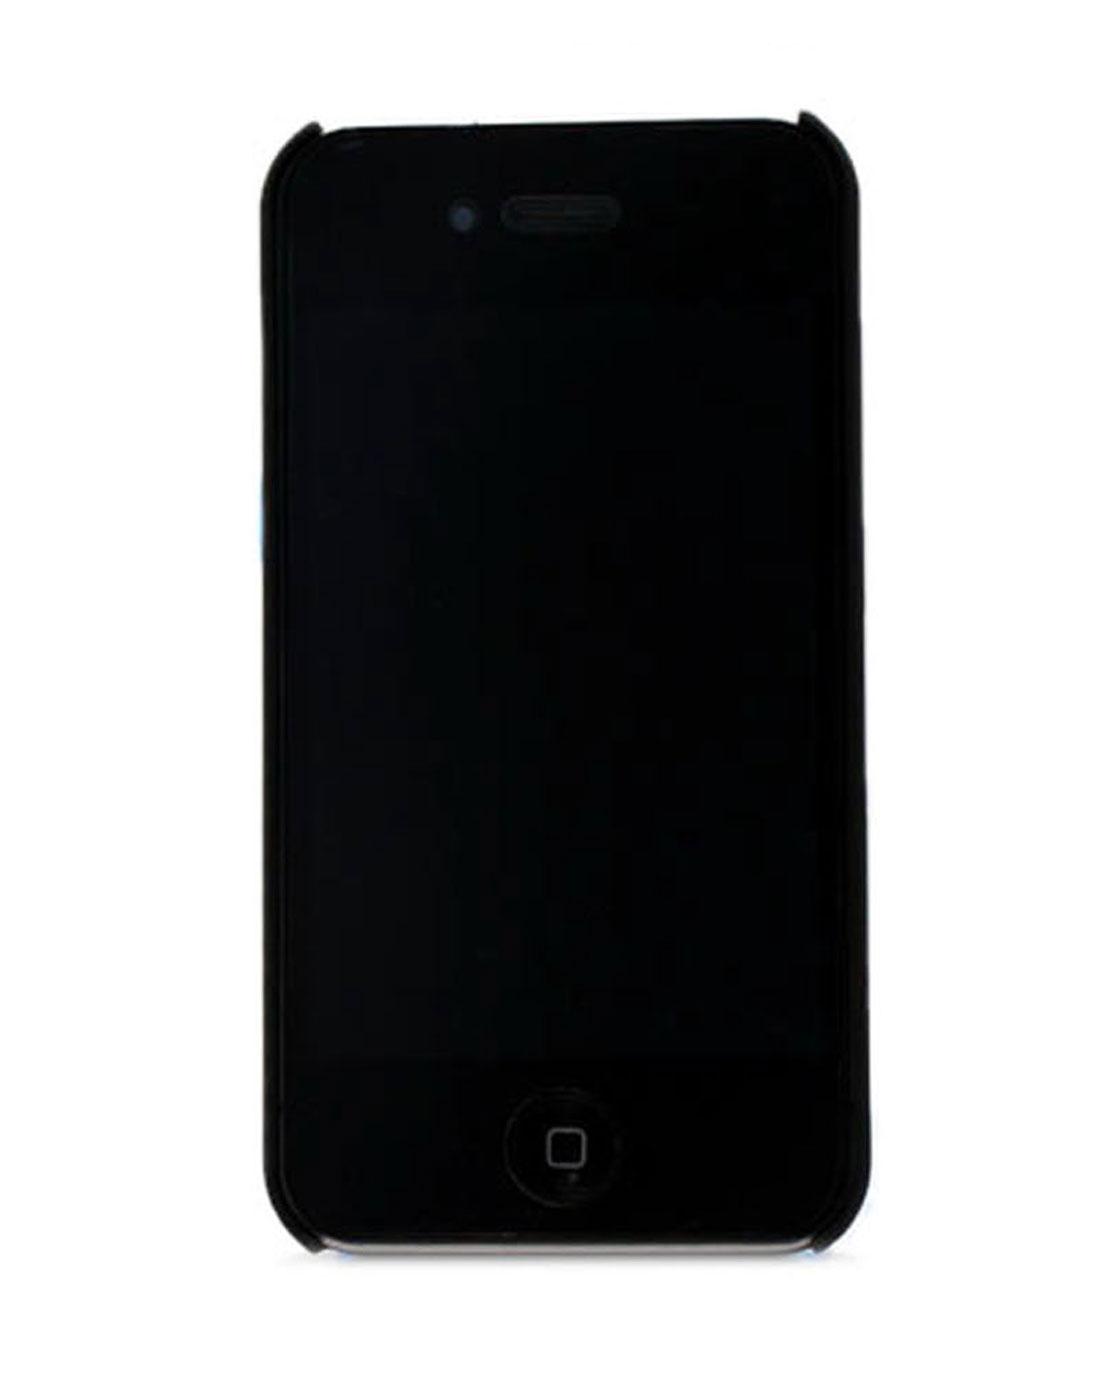 iphone4/4s印象派合金护盾壳黑色